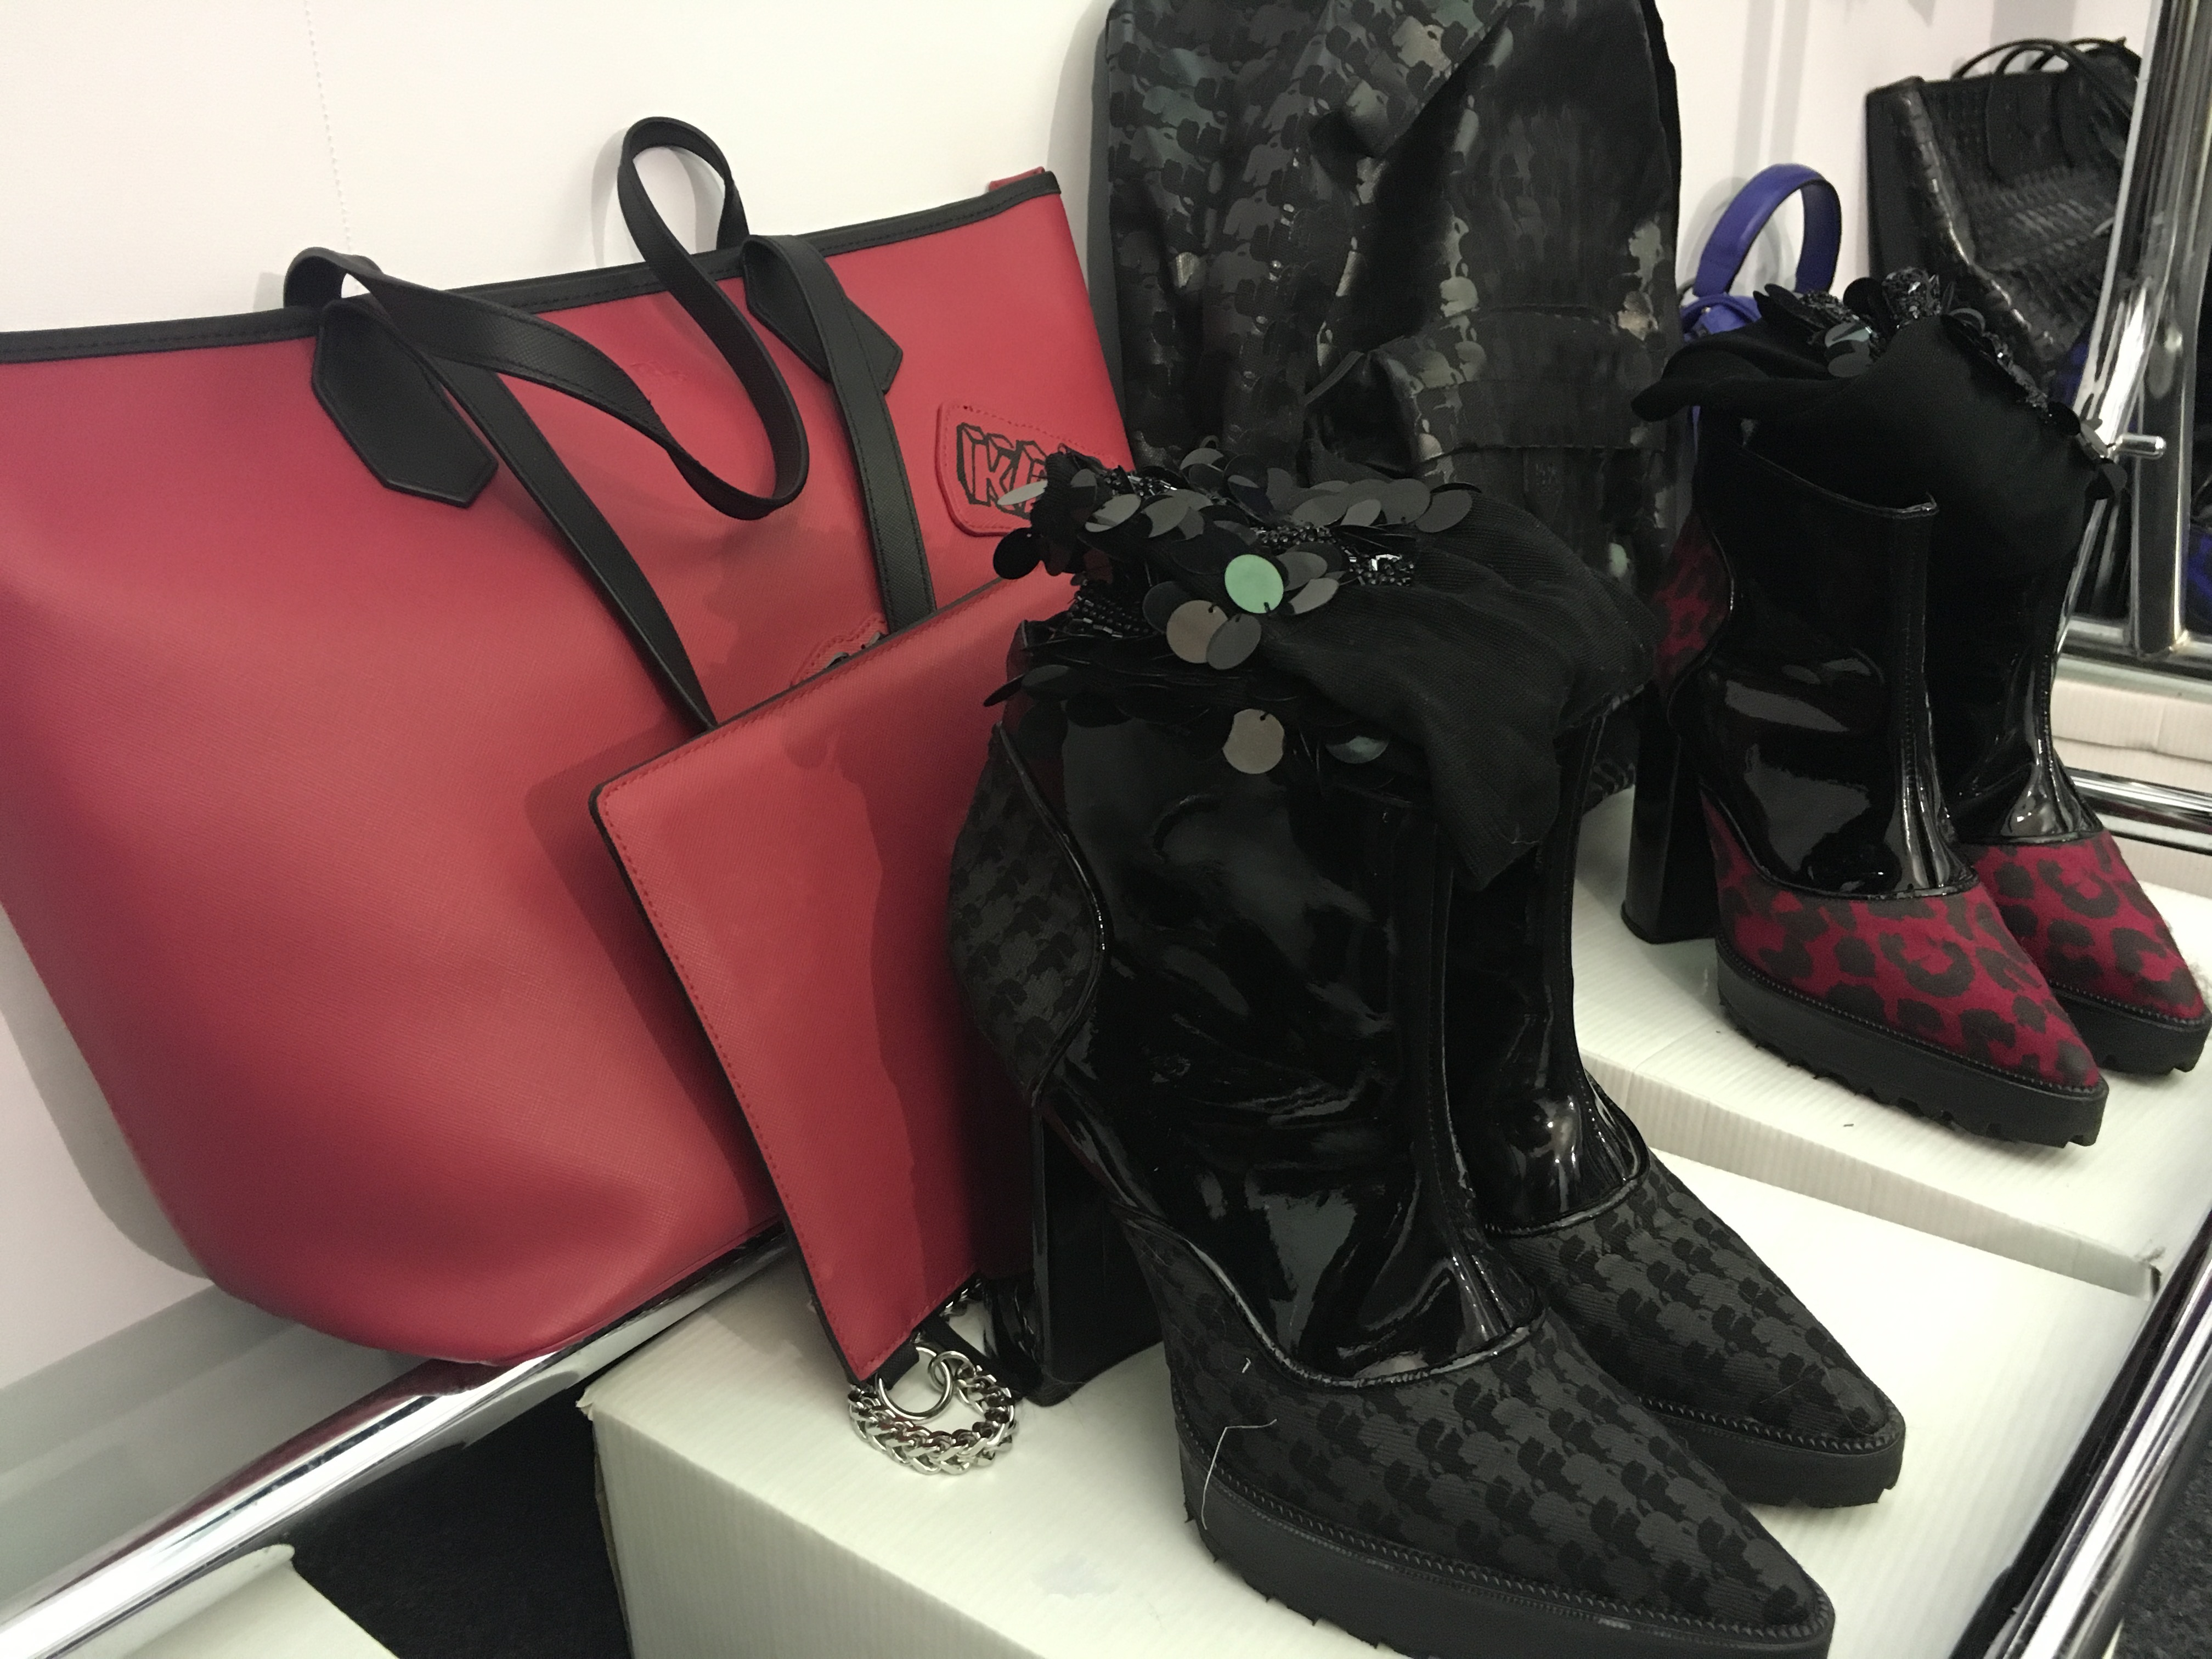 get-the-look-karl-lagerfeld-para-riachuelo-spfw-verao-2016-sapatos-meias